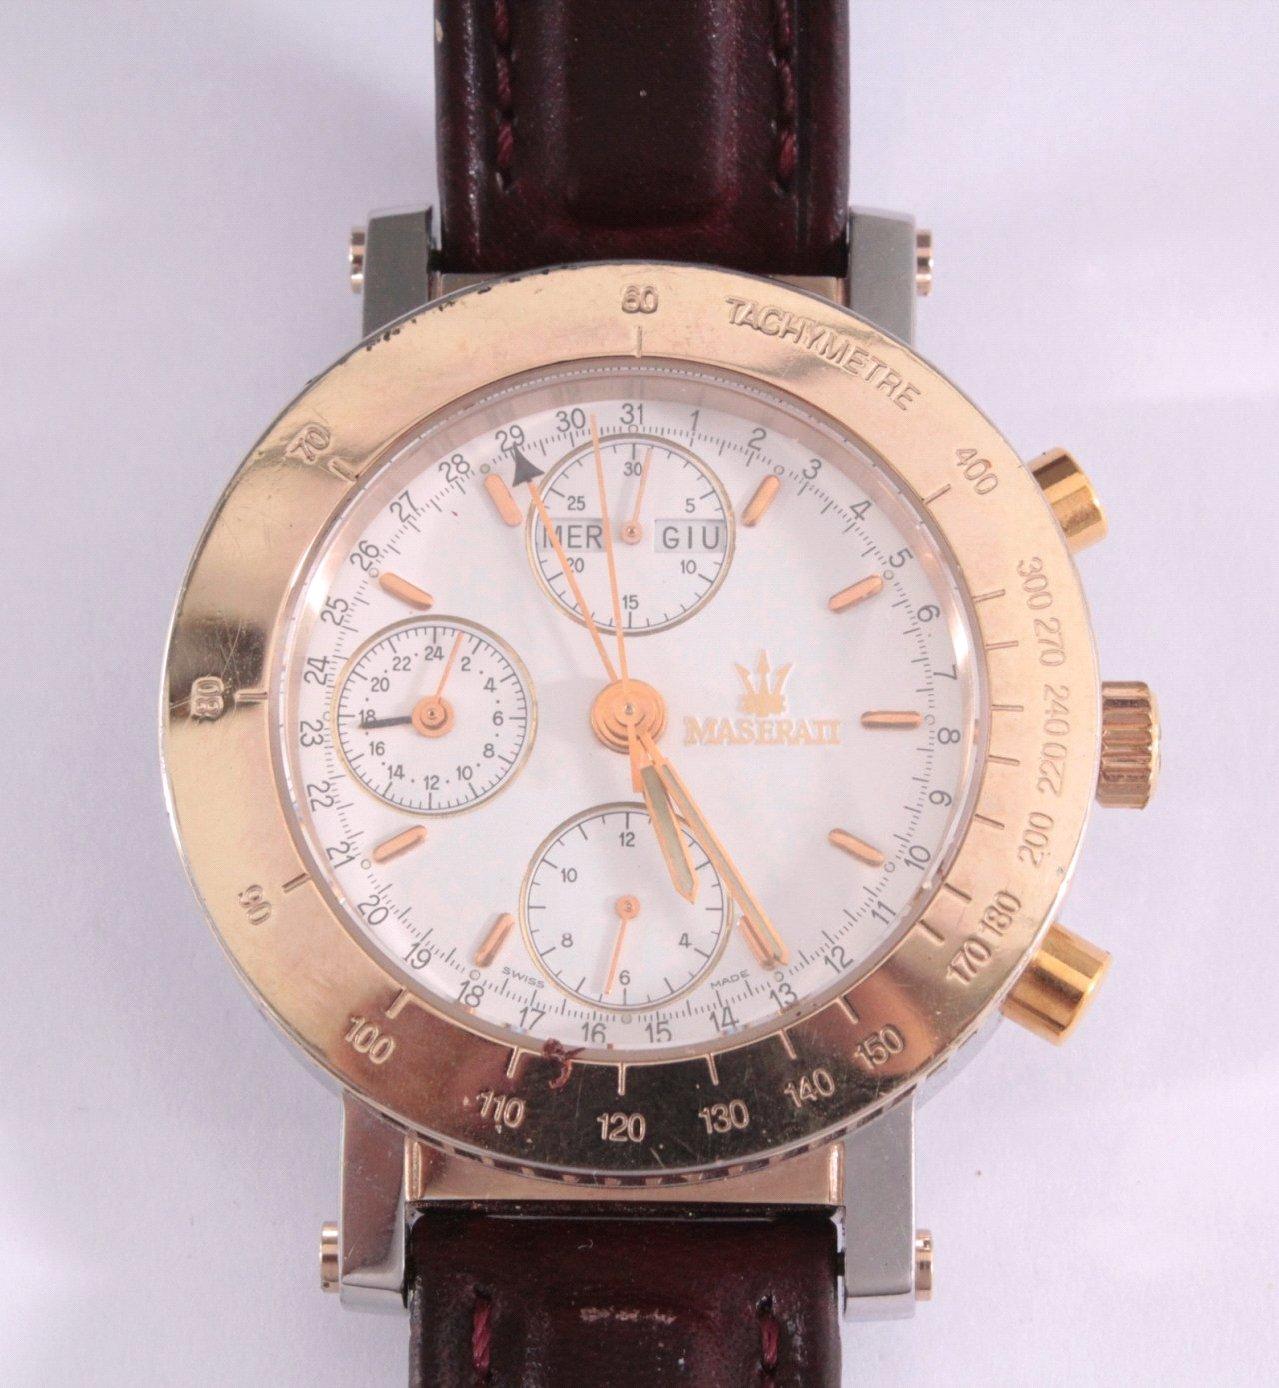 Armbanduhr Maserati Official Timepiece, Modell Karif